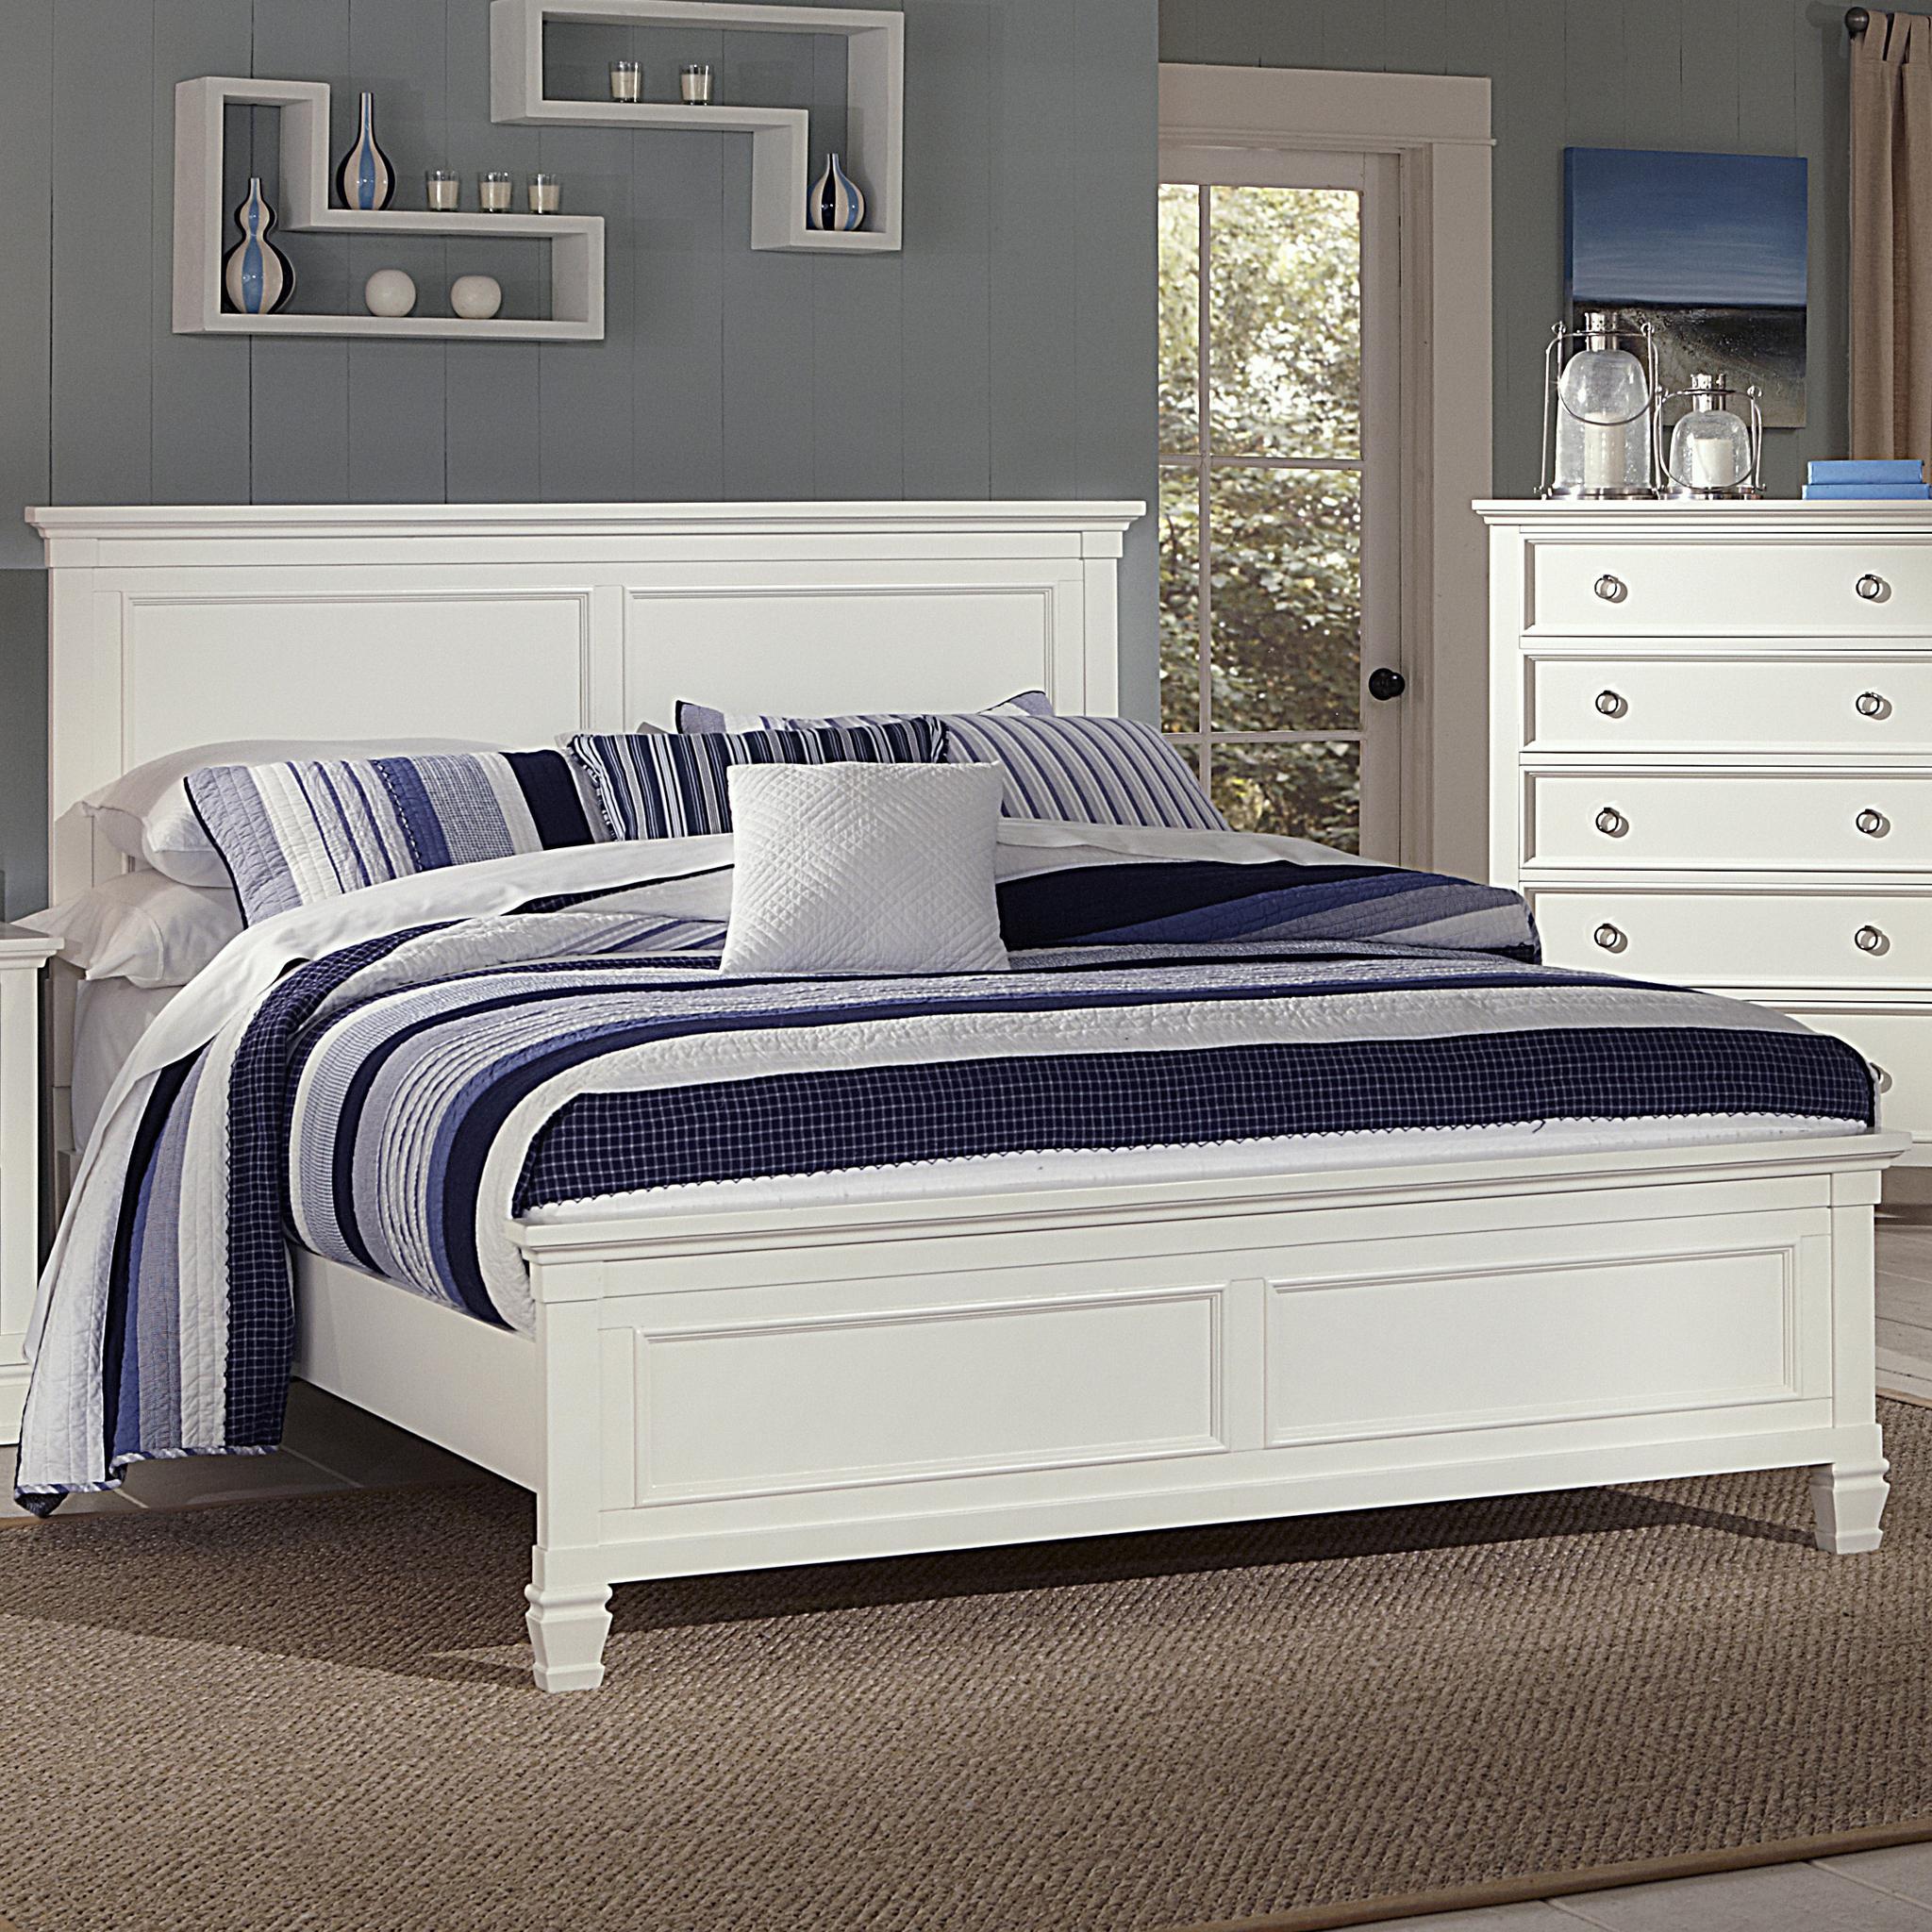 new classic tamarack california king panel headboard and footboard bed dunk bright furniture. Black Bedroom Furniture Sets. Home Design Ideas